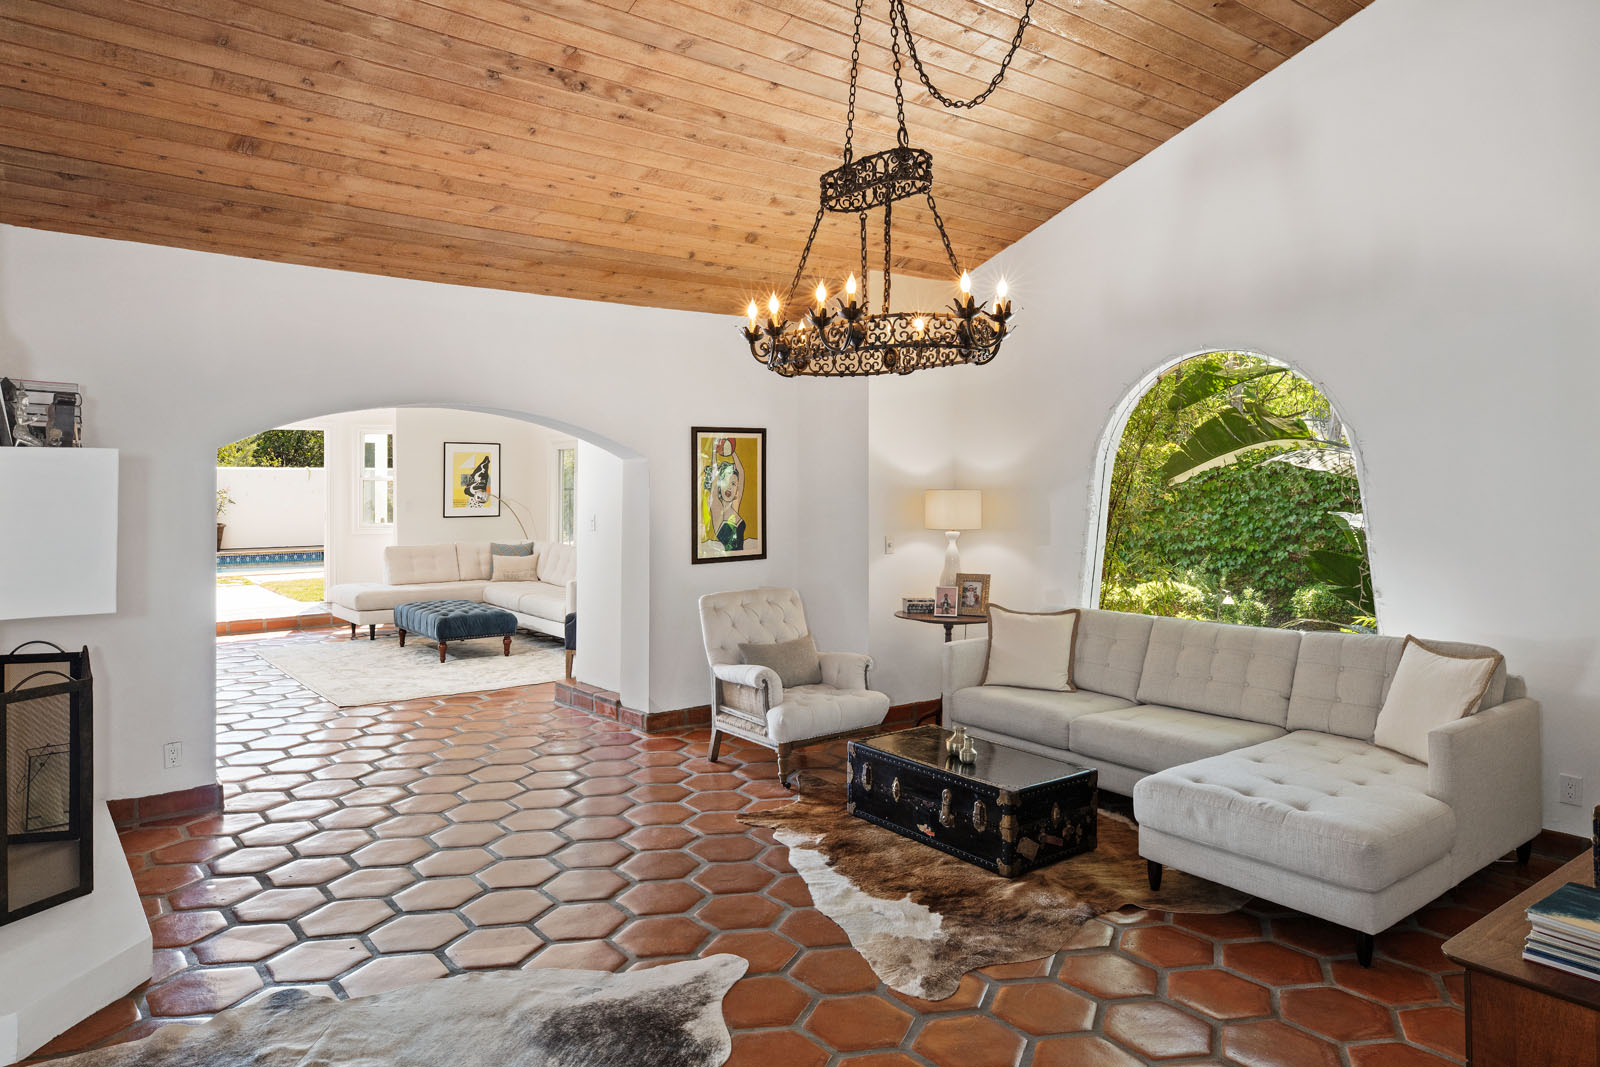 003 Living Room 1712 Manzanita Park Avenue Malibu For Sale Lease The Malibu Life Team Luxury Real Estate.jpg